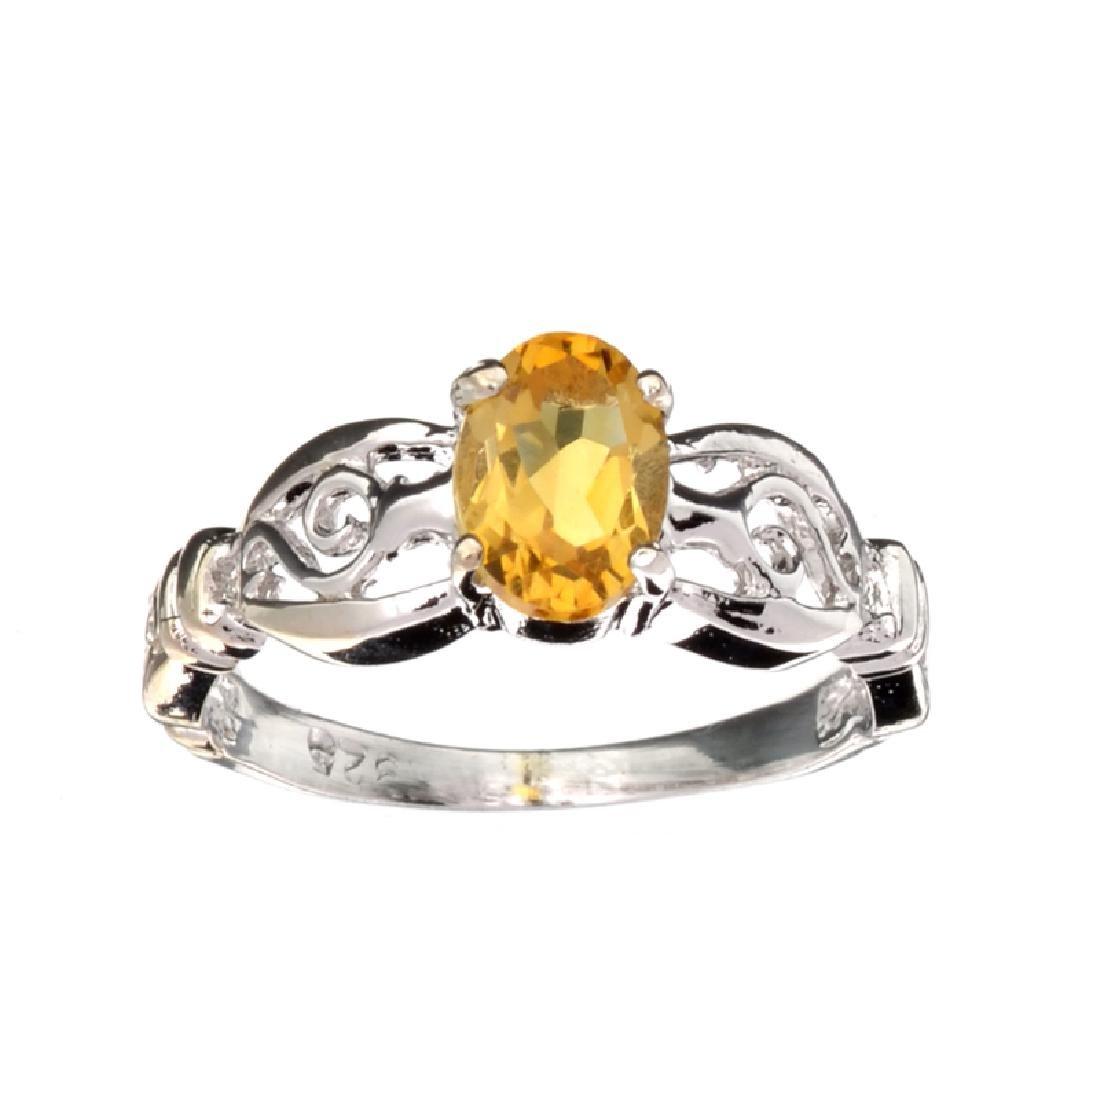 APP: 0.6k Fine Jewelry 0.86CT Oval Cut Citrinie Quartz